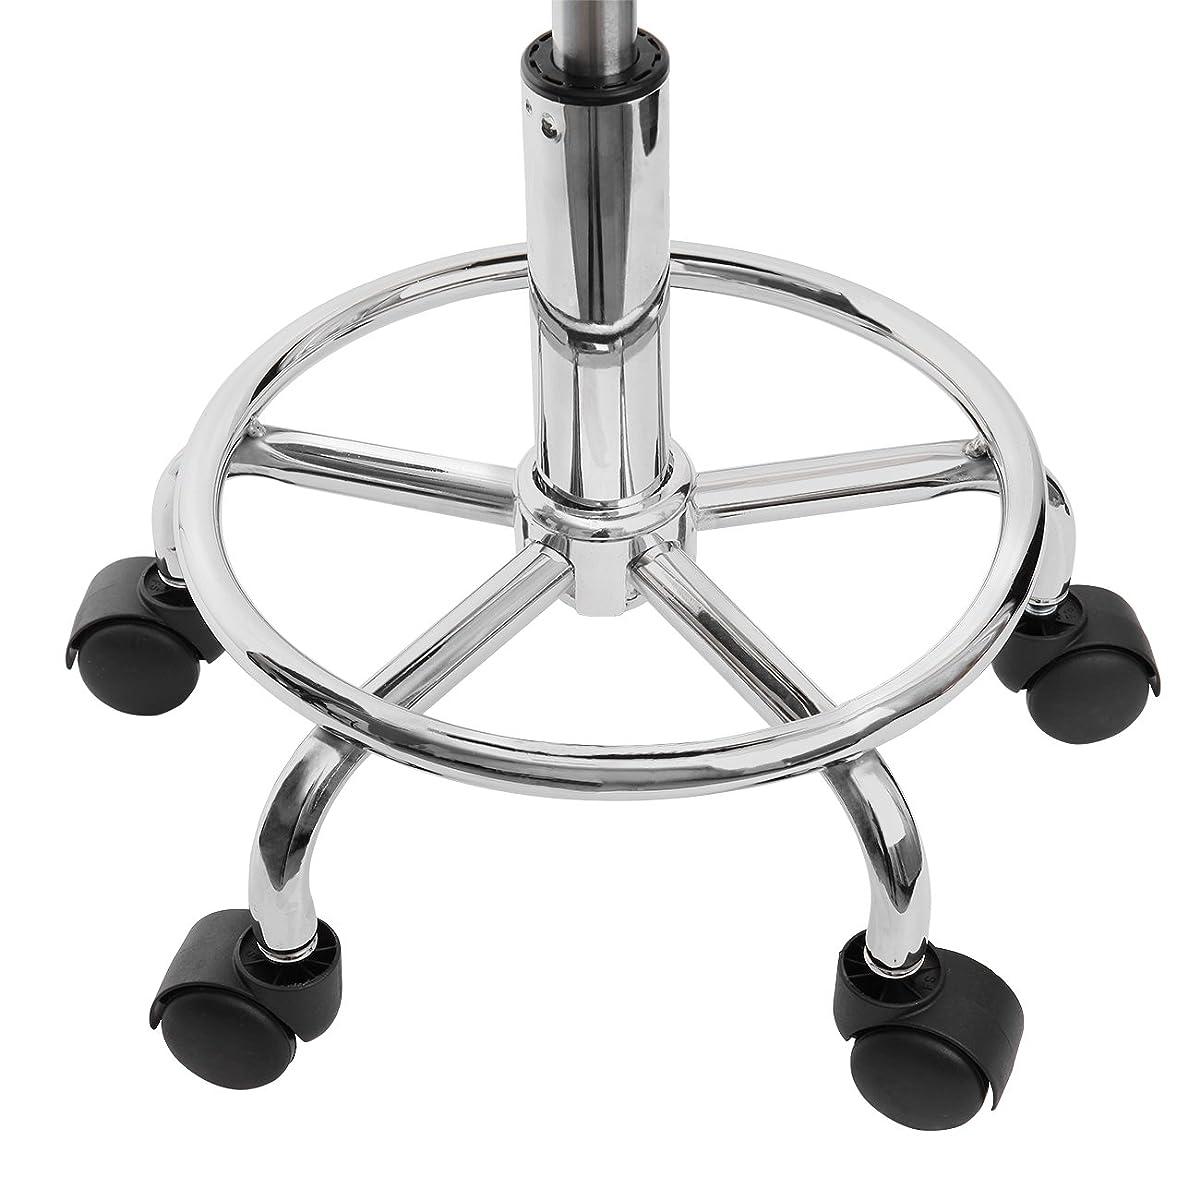 Ridgeyard Adjustable Hydraulic Saddle Rolling Chair Tattoo Facial Saddle Massage Stool Spa Salon Seat (Black)